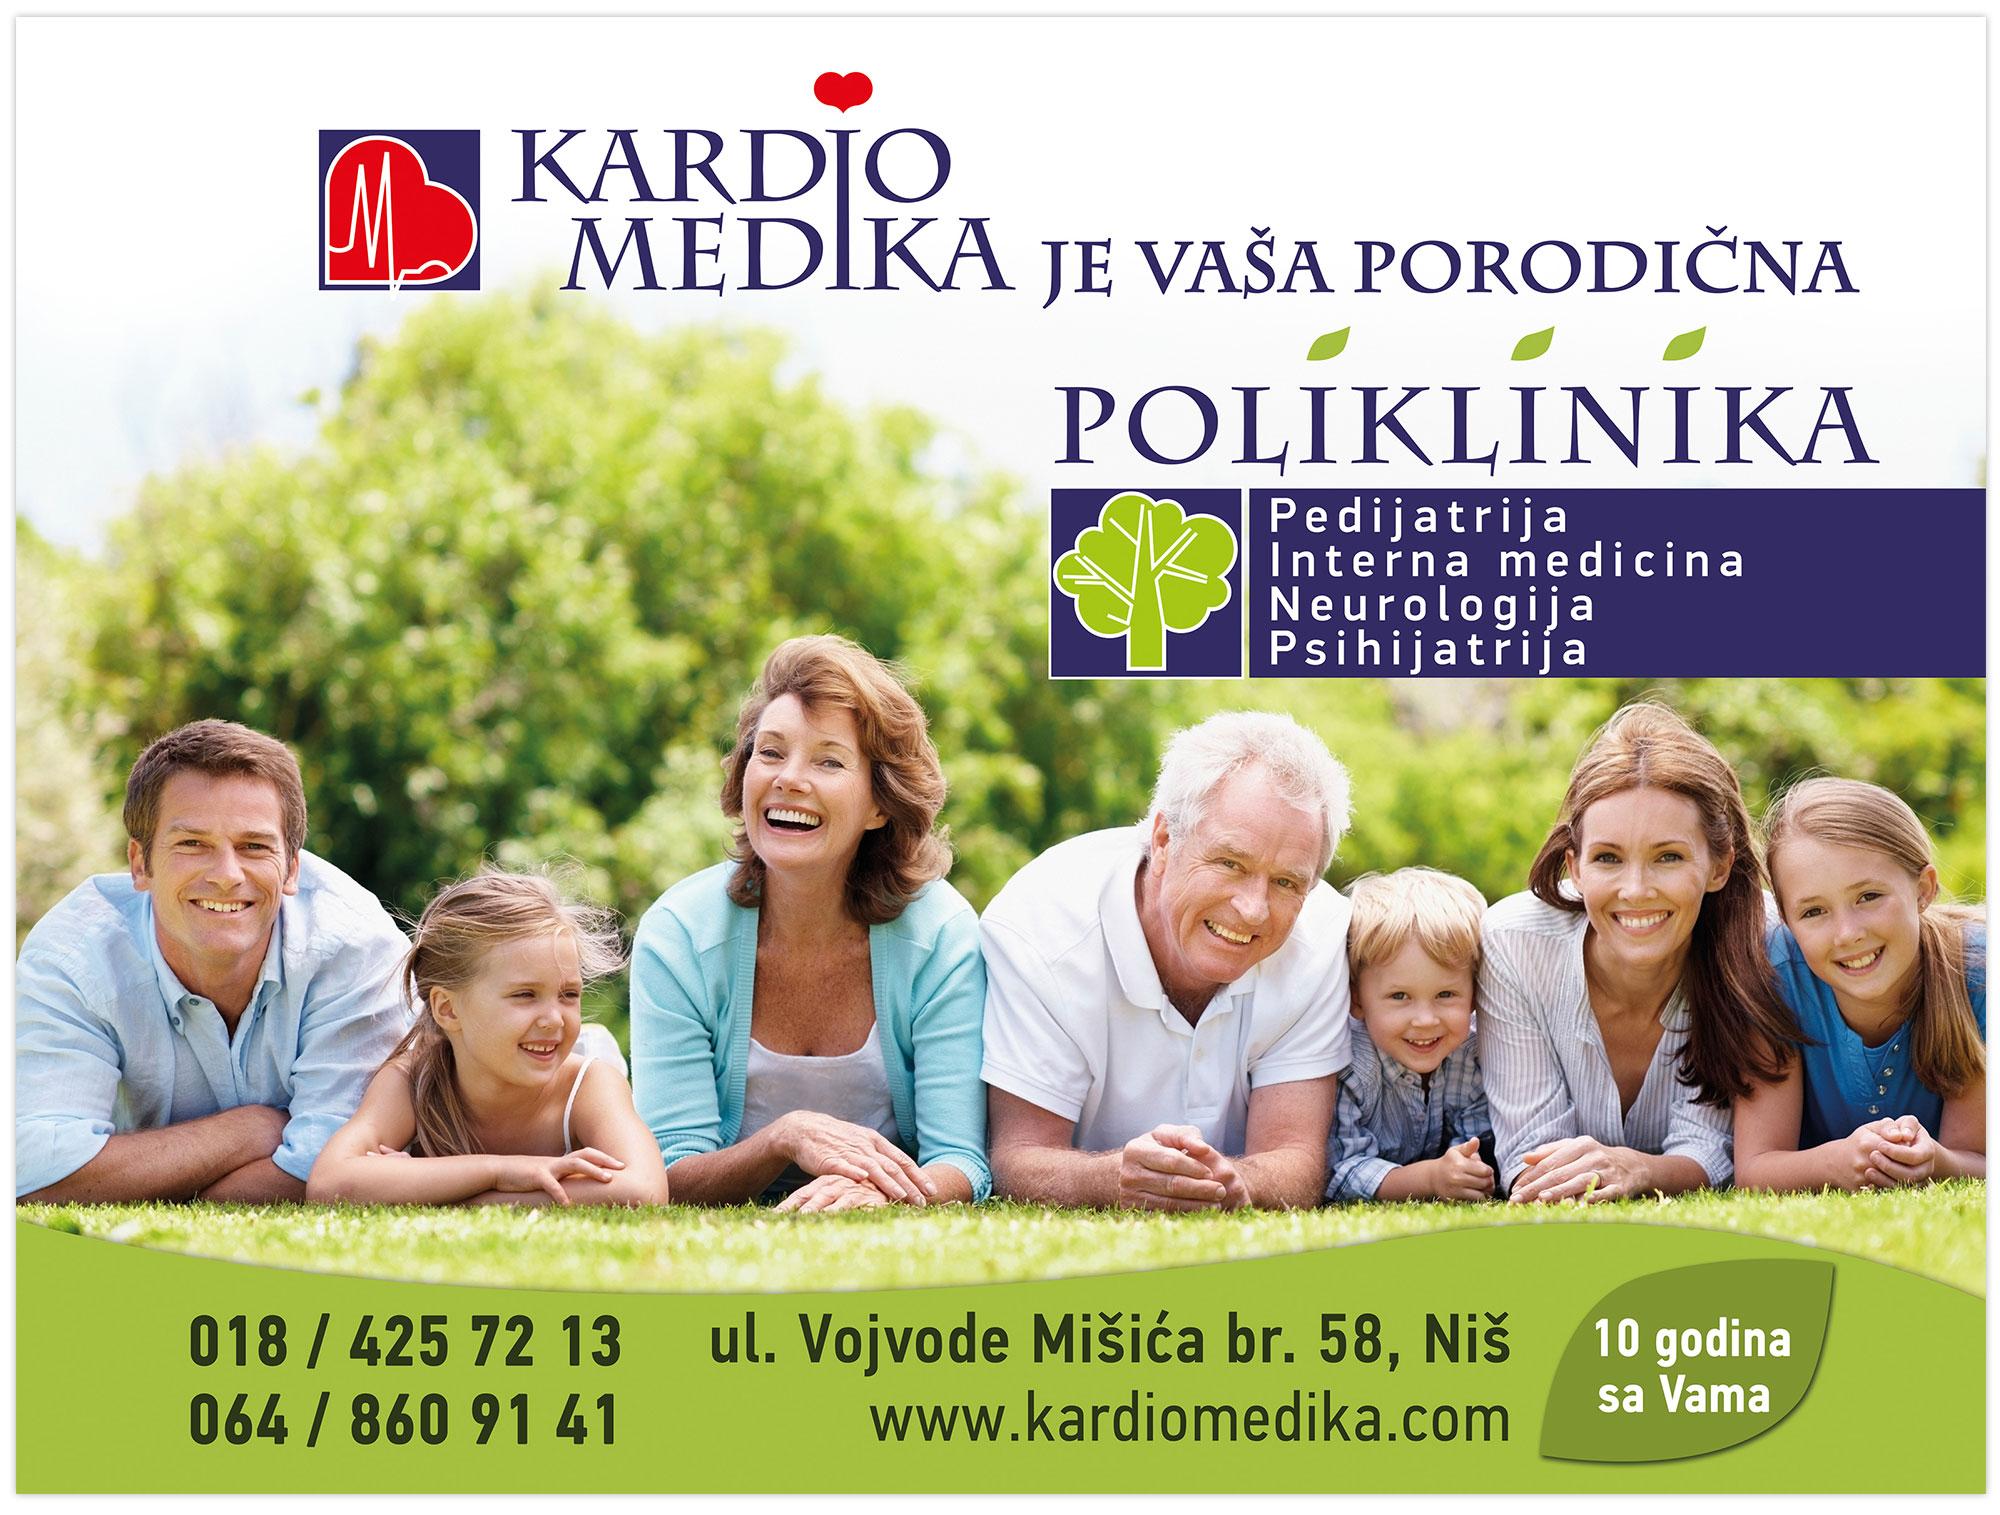 kardiomedica poster 1